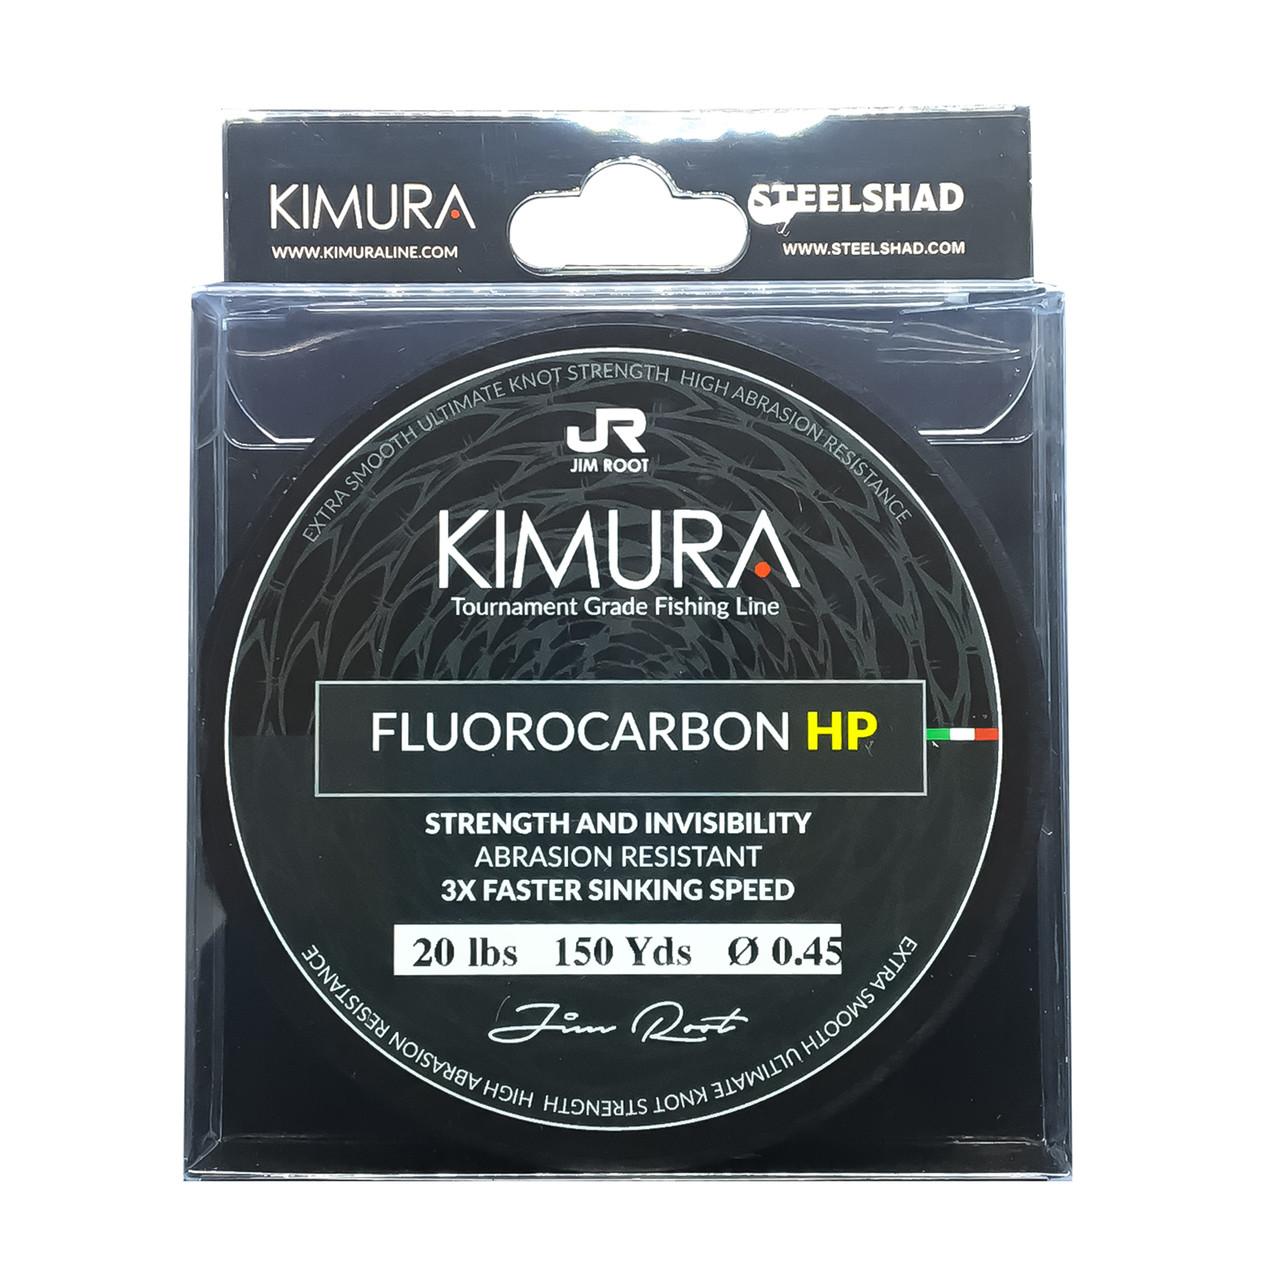 SteelShad Kimura Fishing Line - Fluorocarbon